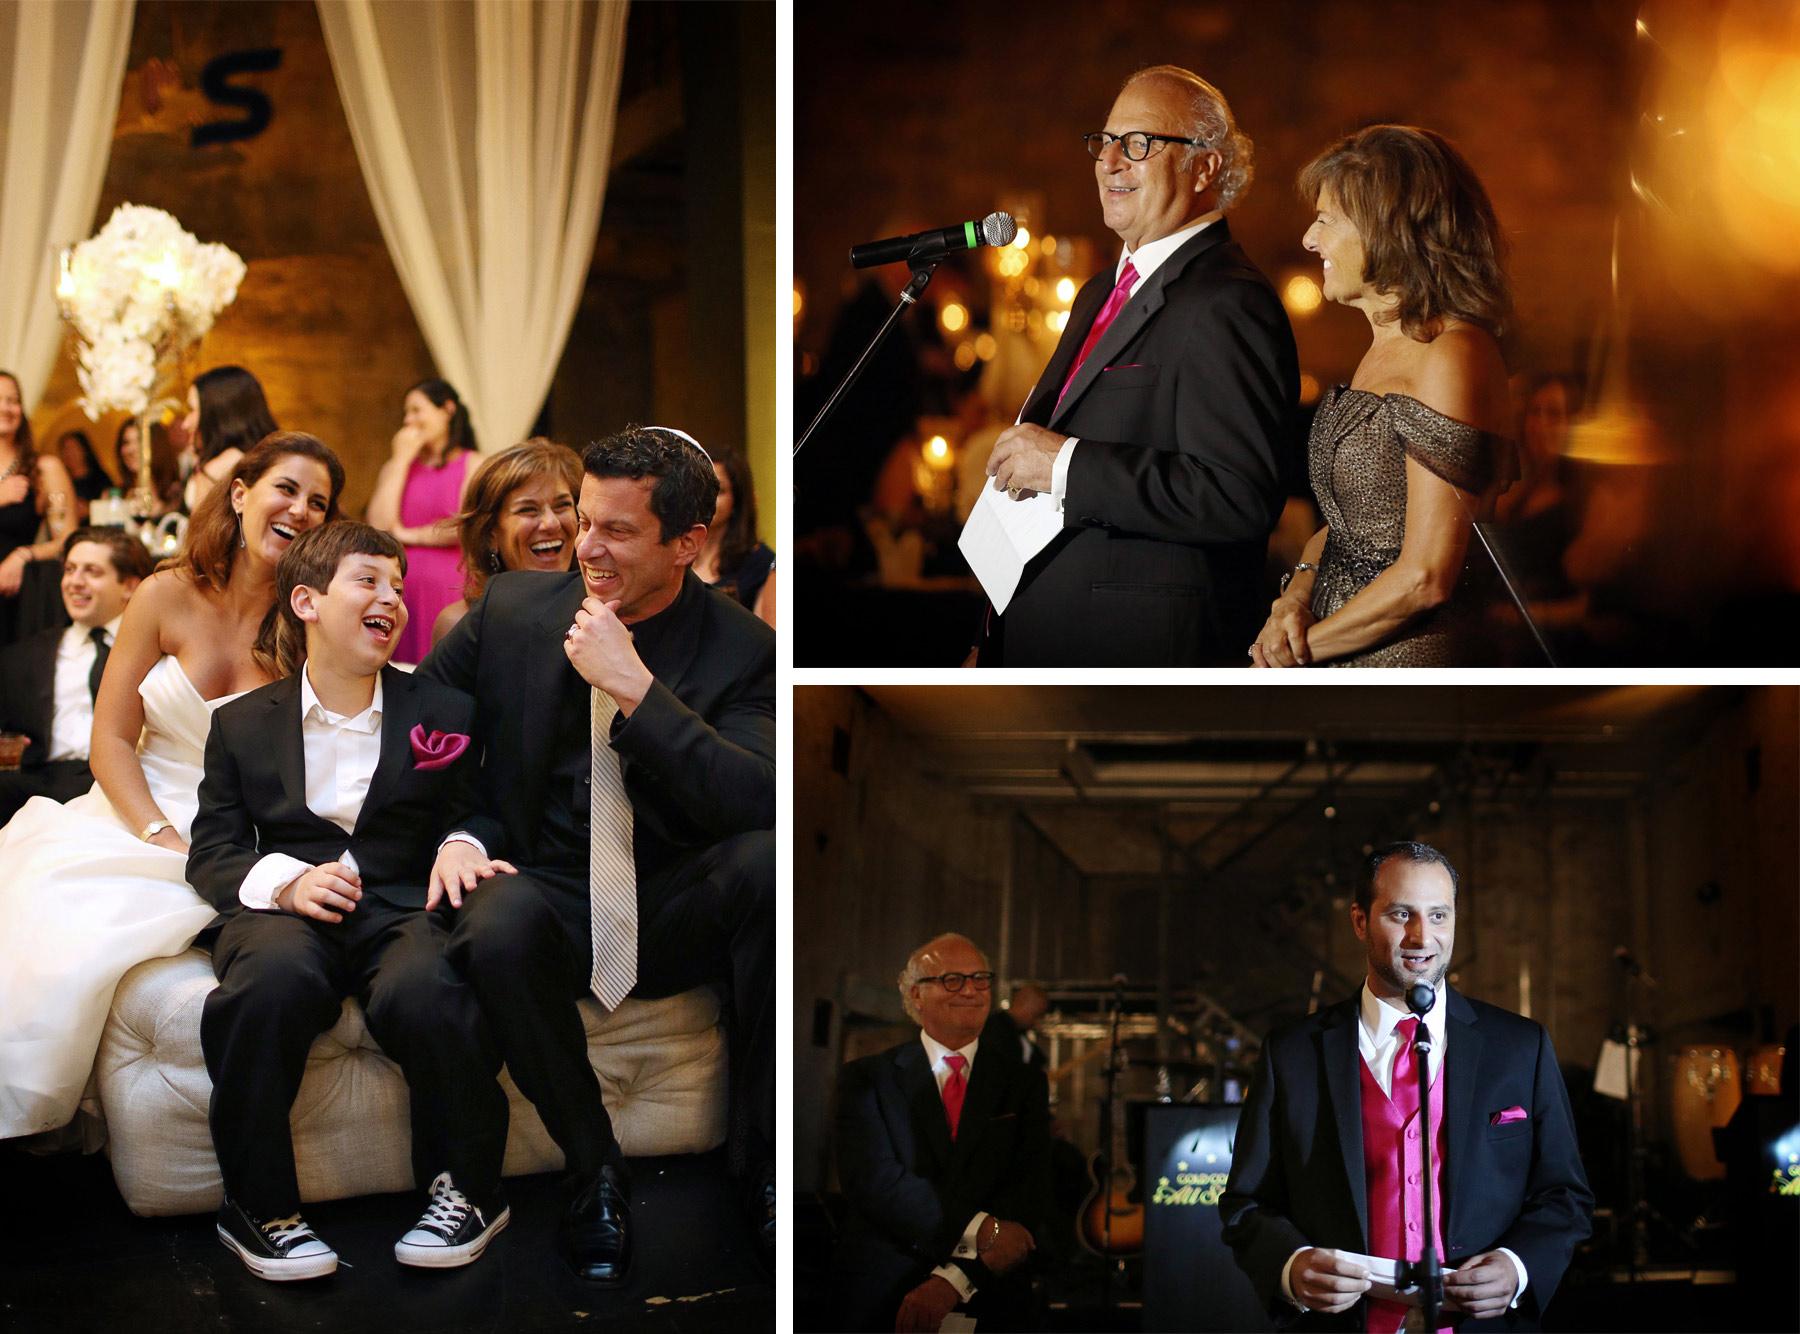 16-Minneapolis-Minnesota-Wedding-Photography-by-Vick-Photography-Aria-Reception-Layne-&-Dan.jpg